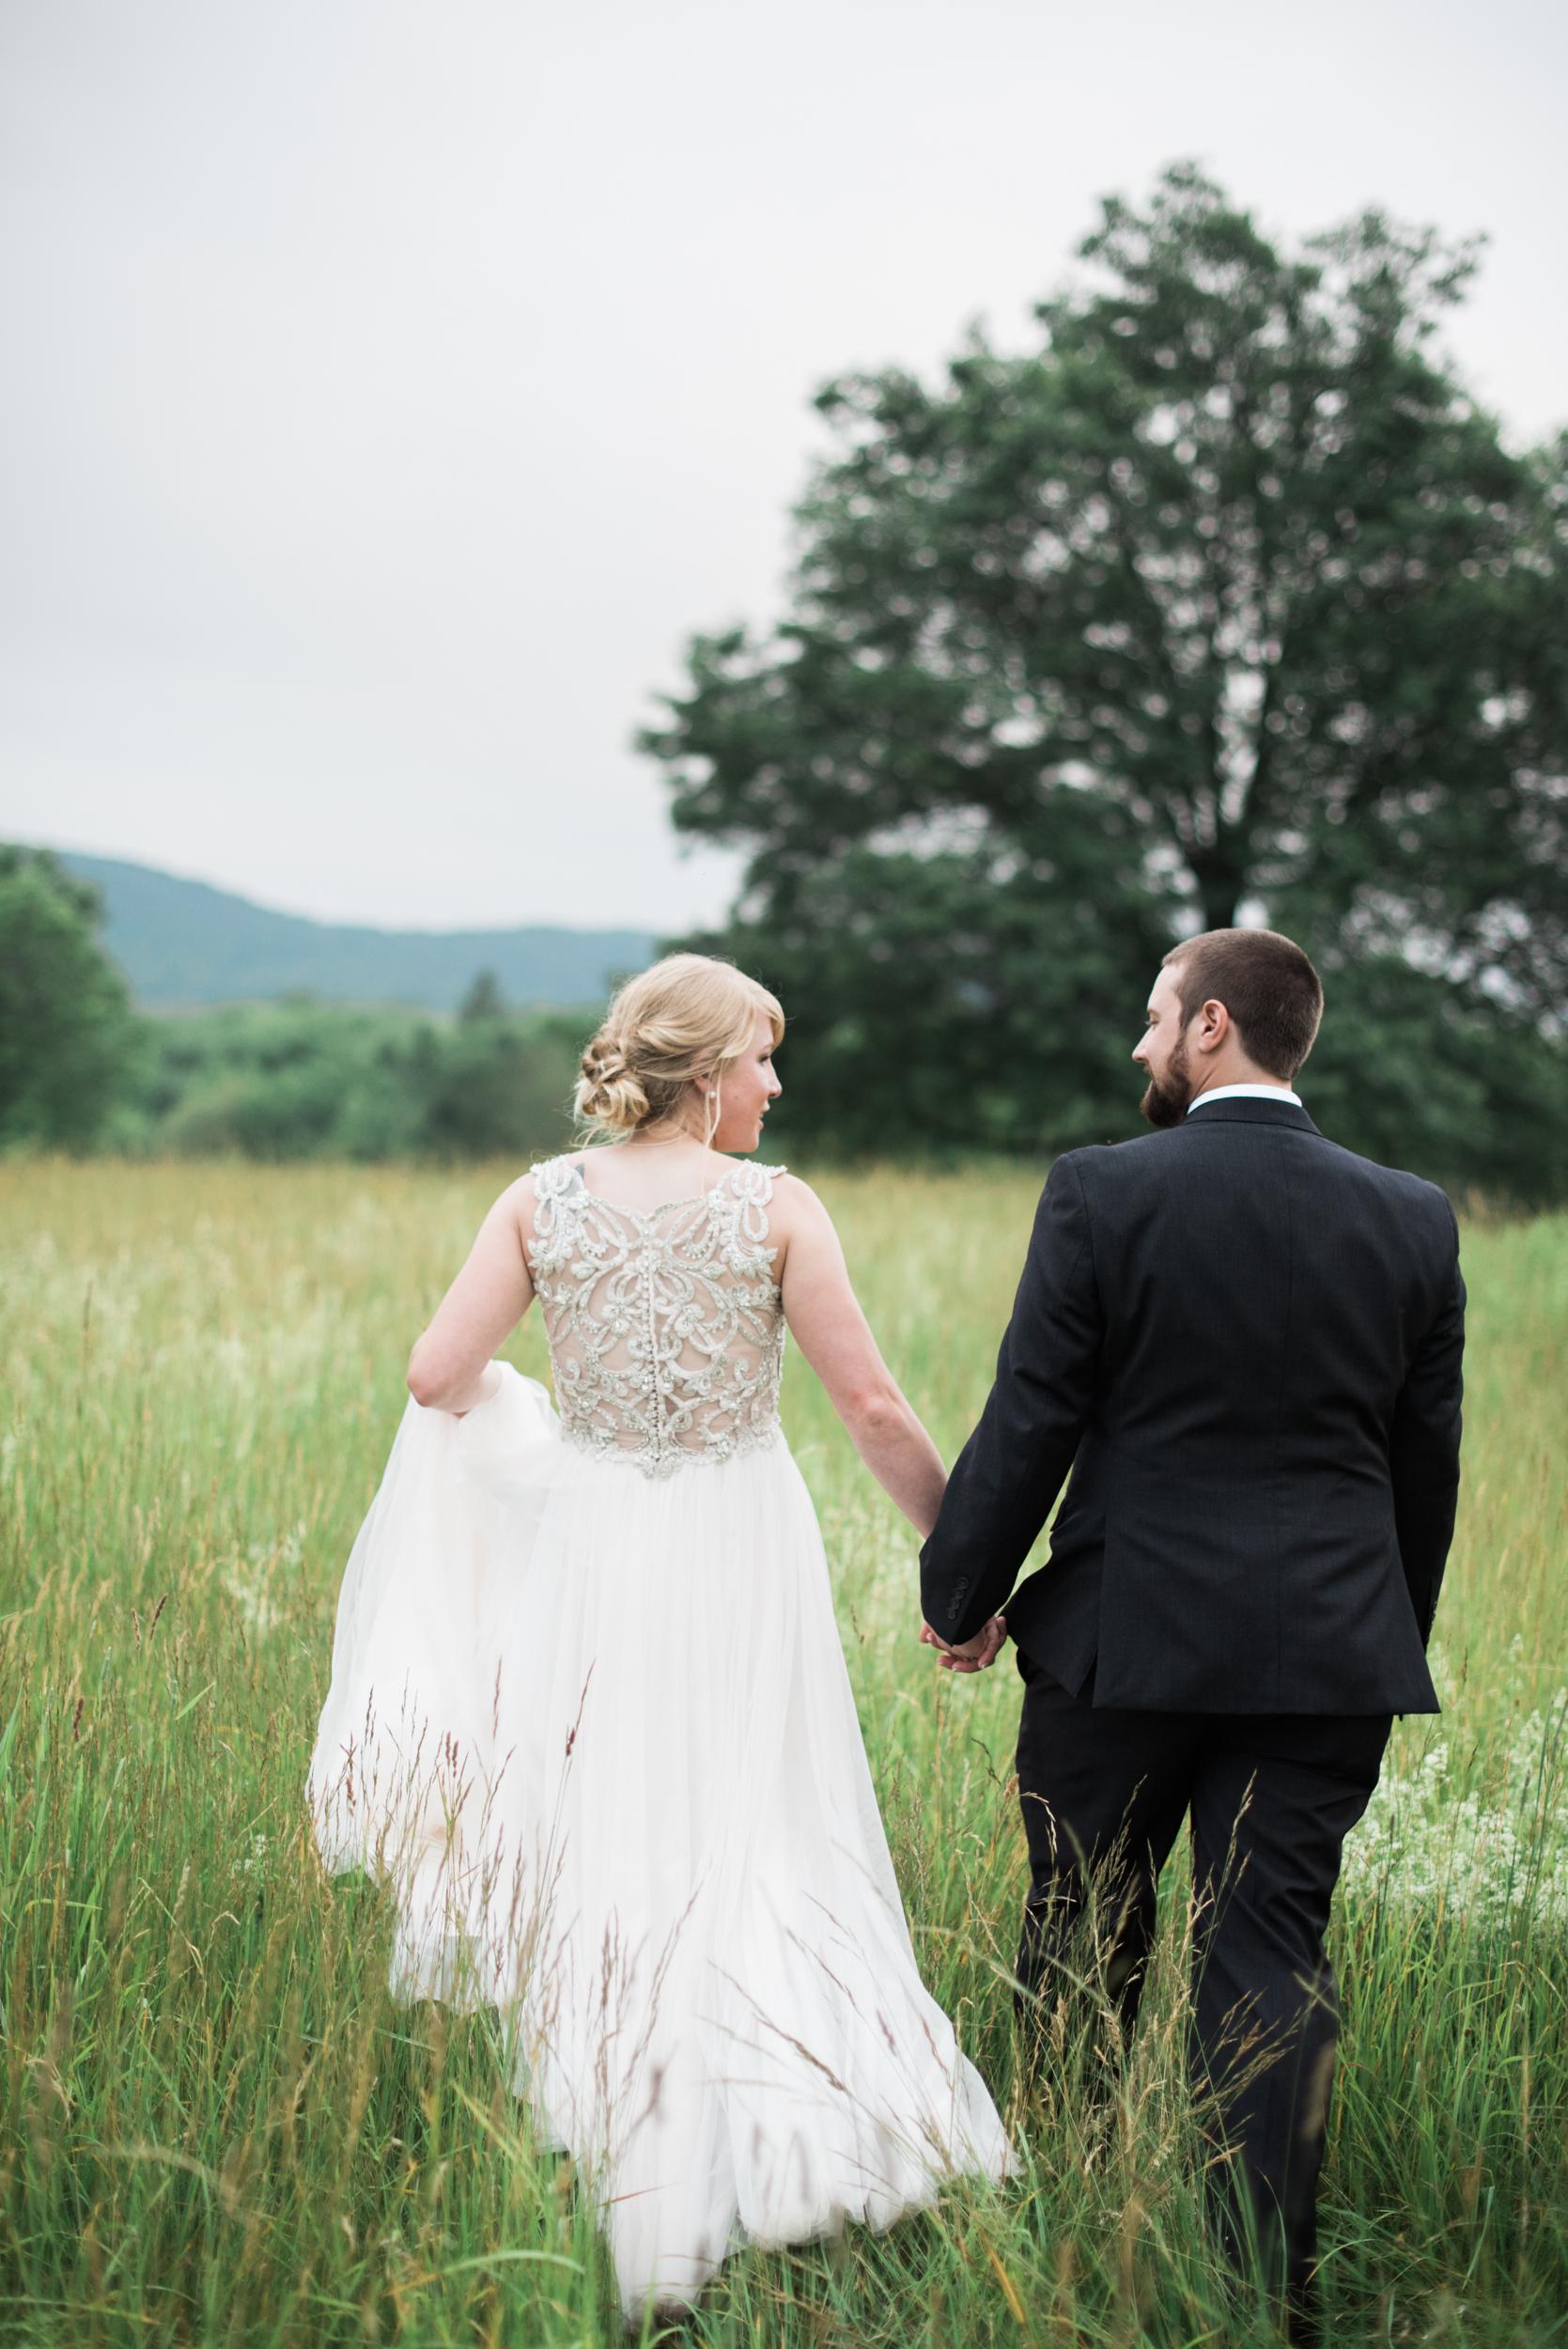 Rustic wedding venues in Massachusetts